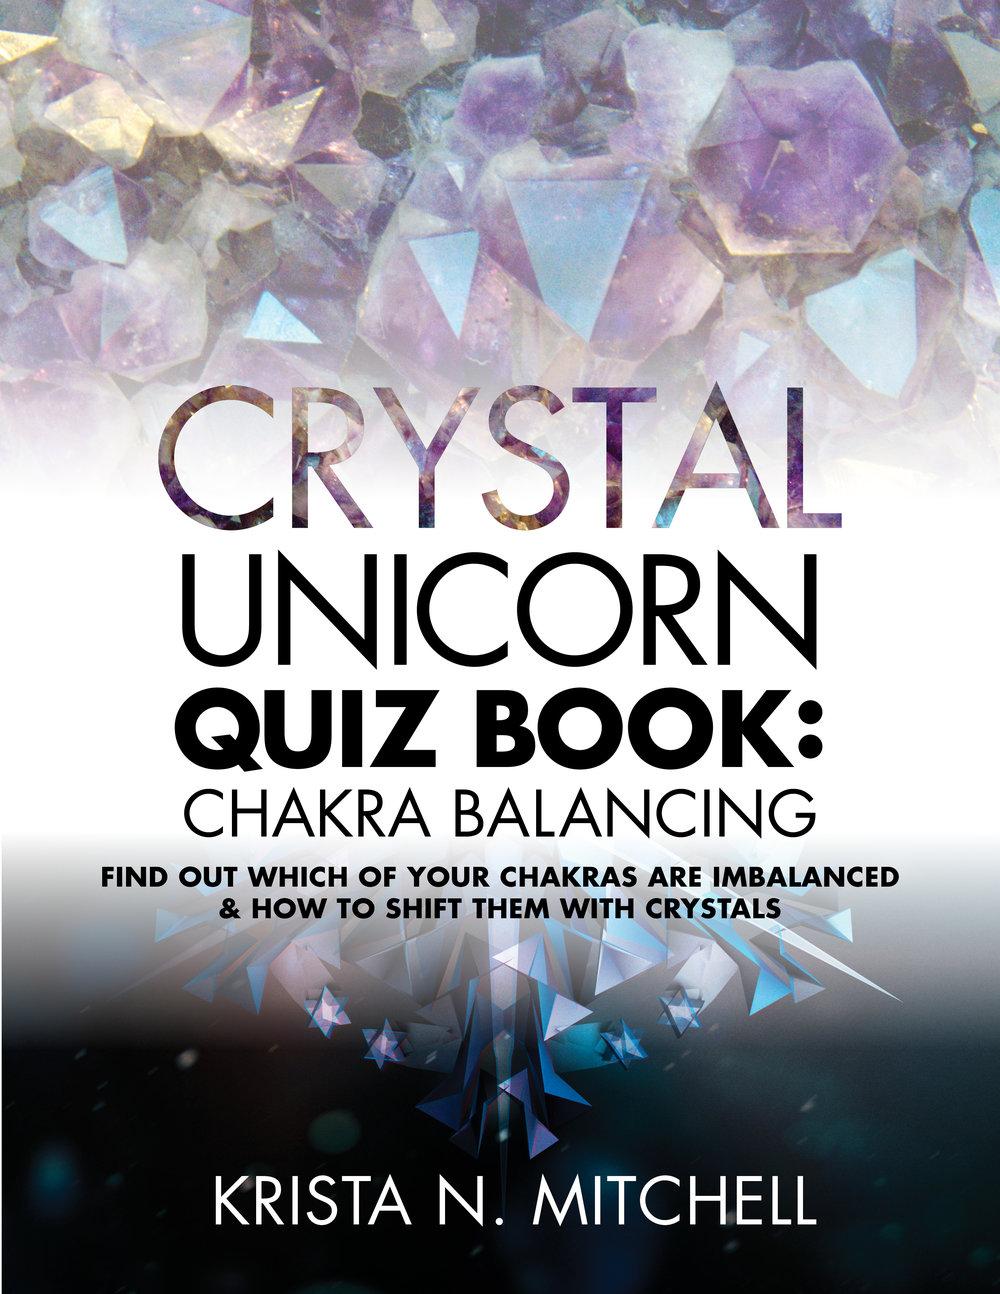 Crystal Unicorn Quiz Book / krista-mitchell.com